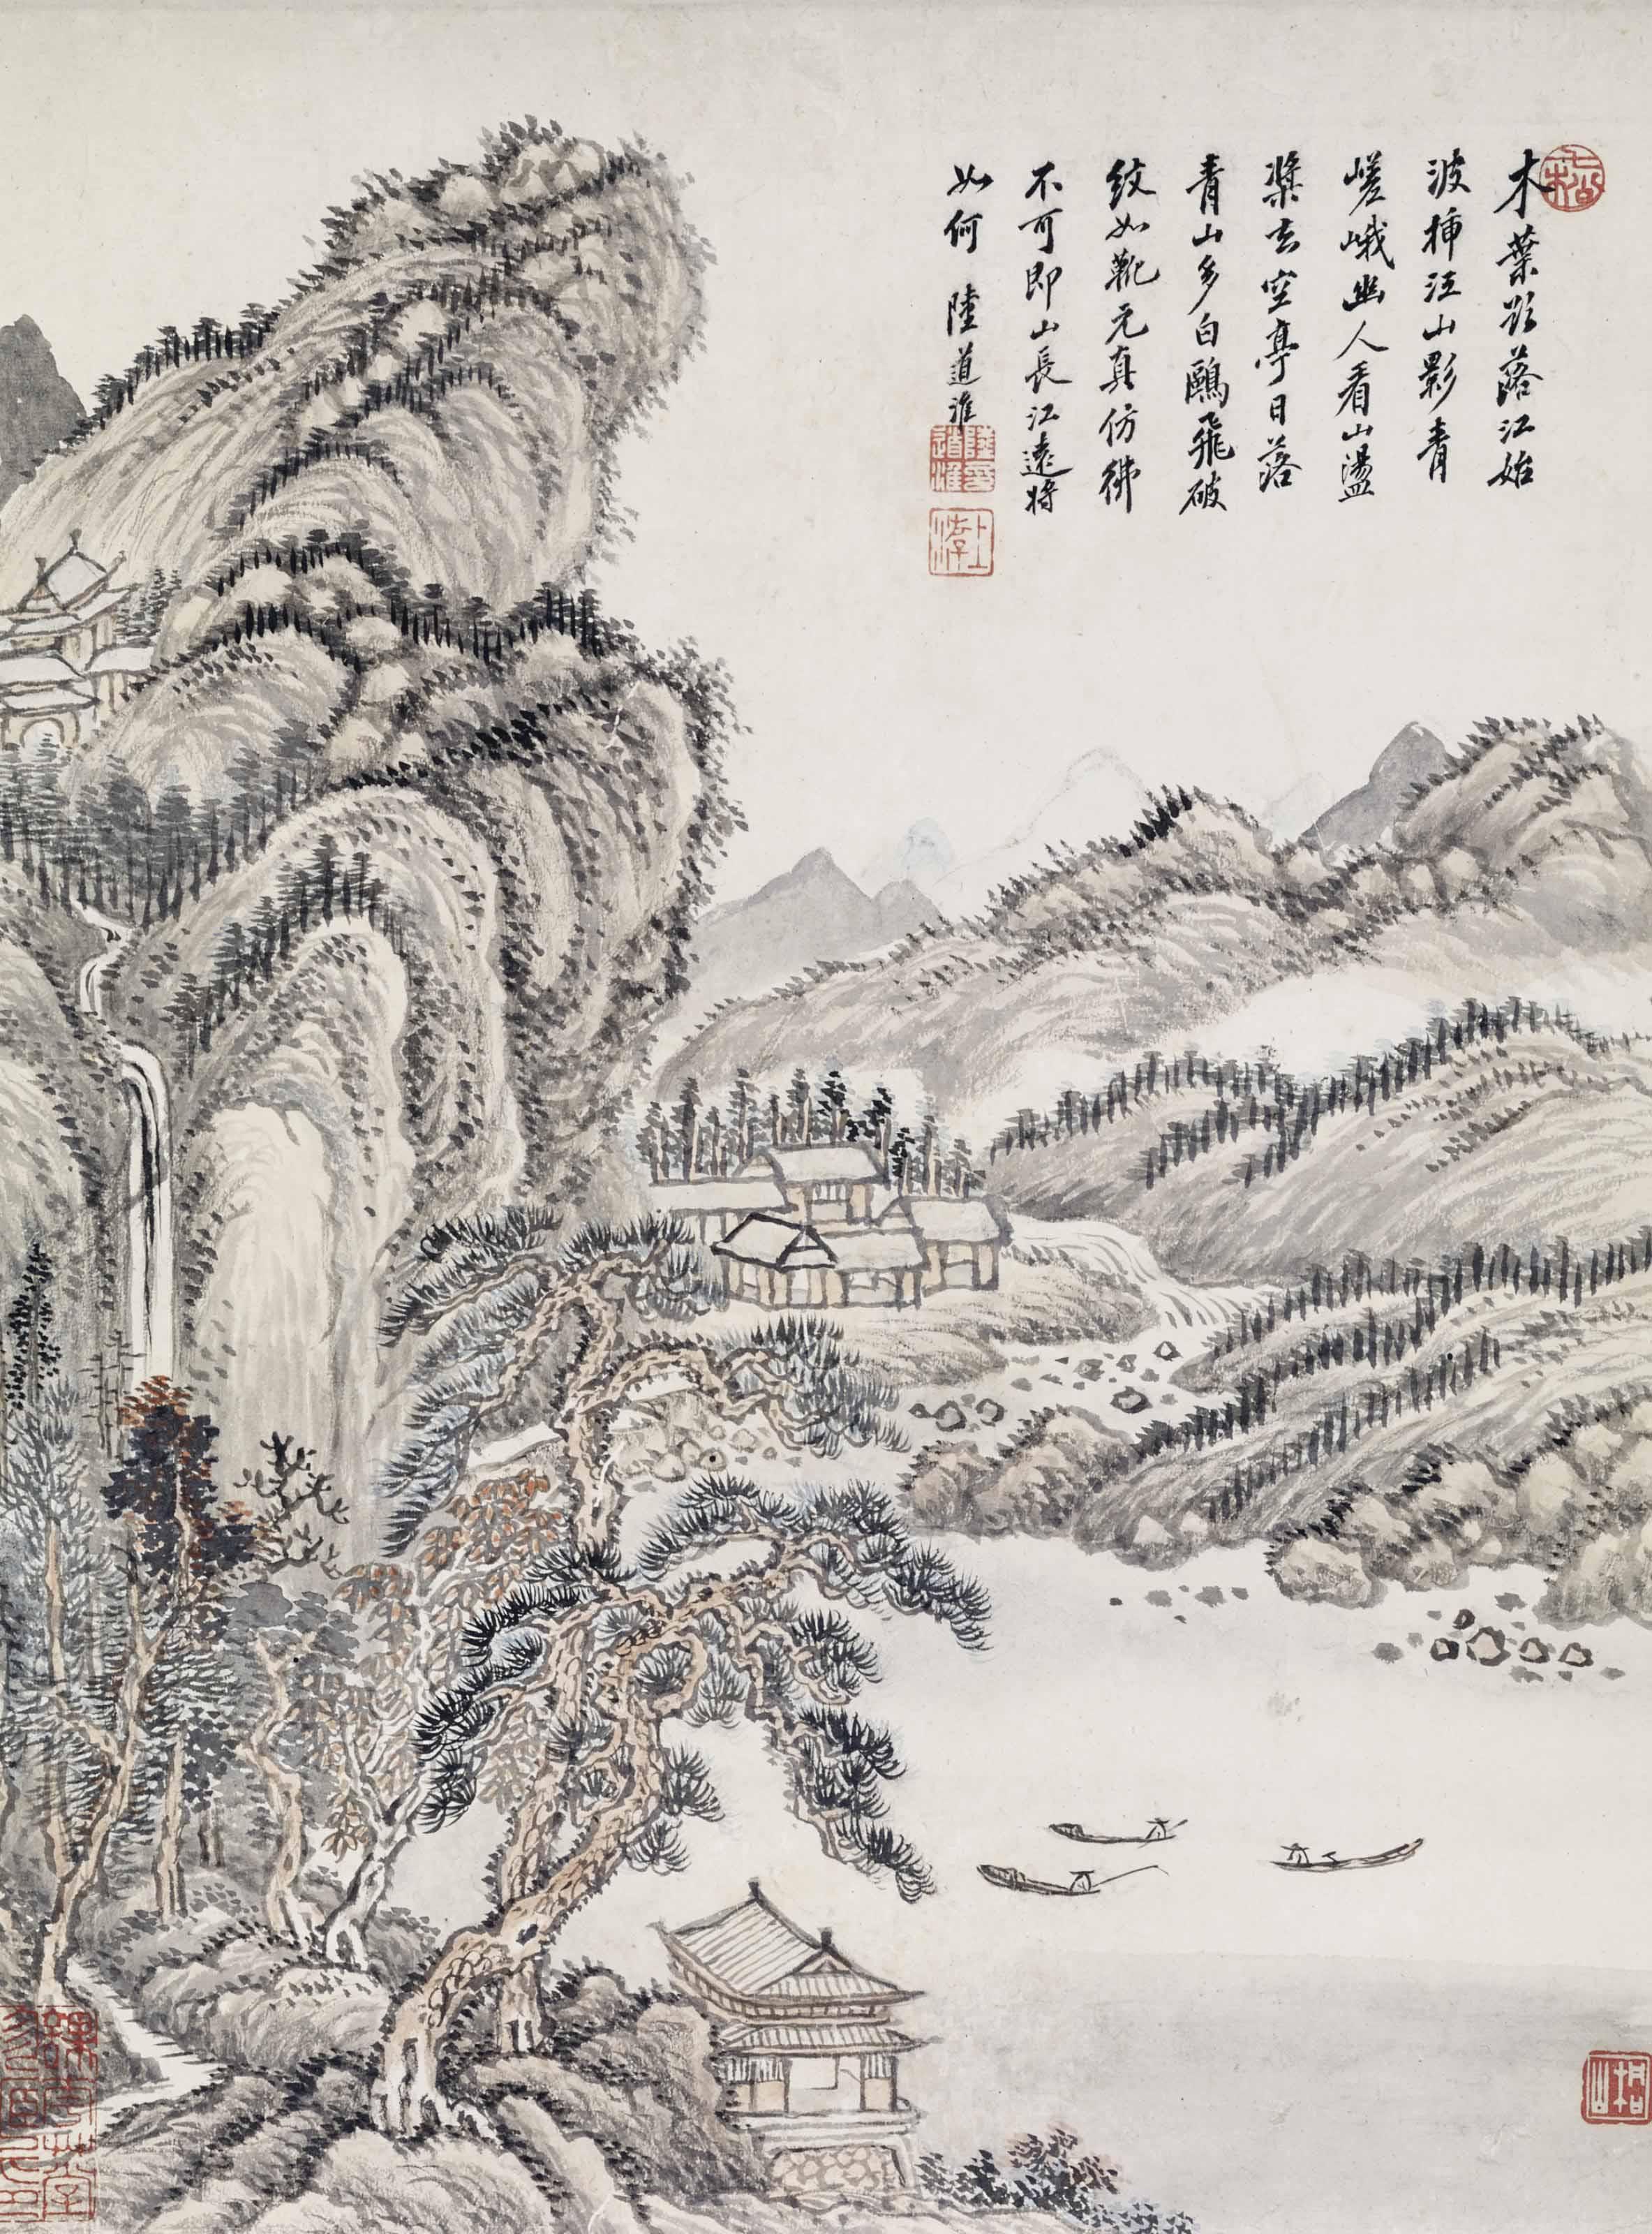 LU DAOHUAI (QING DYNASTY, LATE 17TH CENTURY)